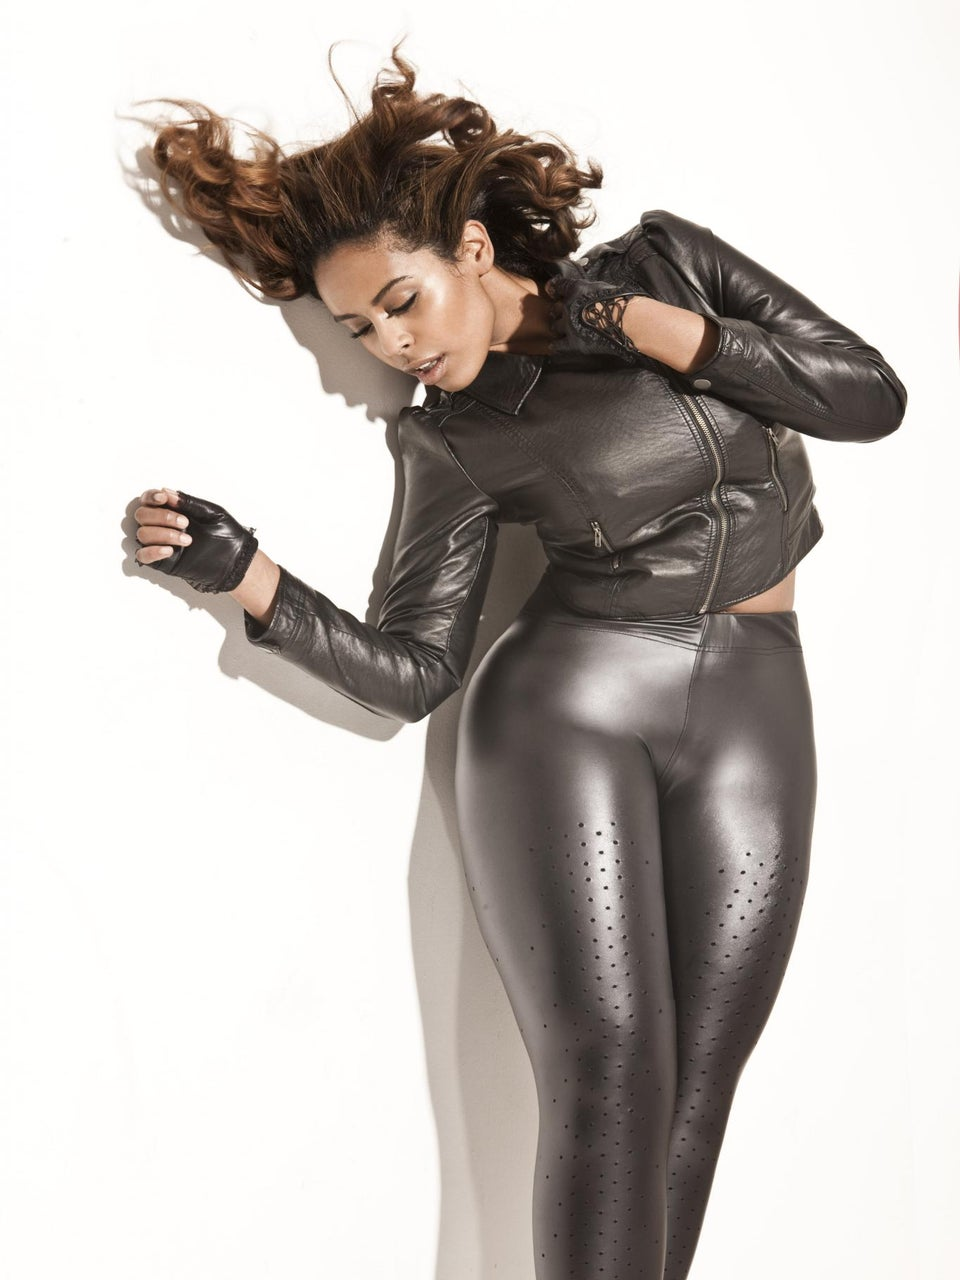 Curvy Model of The Month: Jordan Tesfay